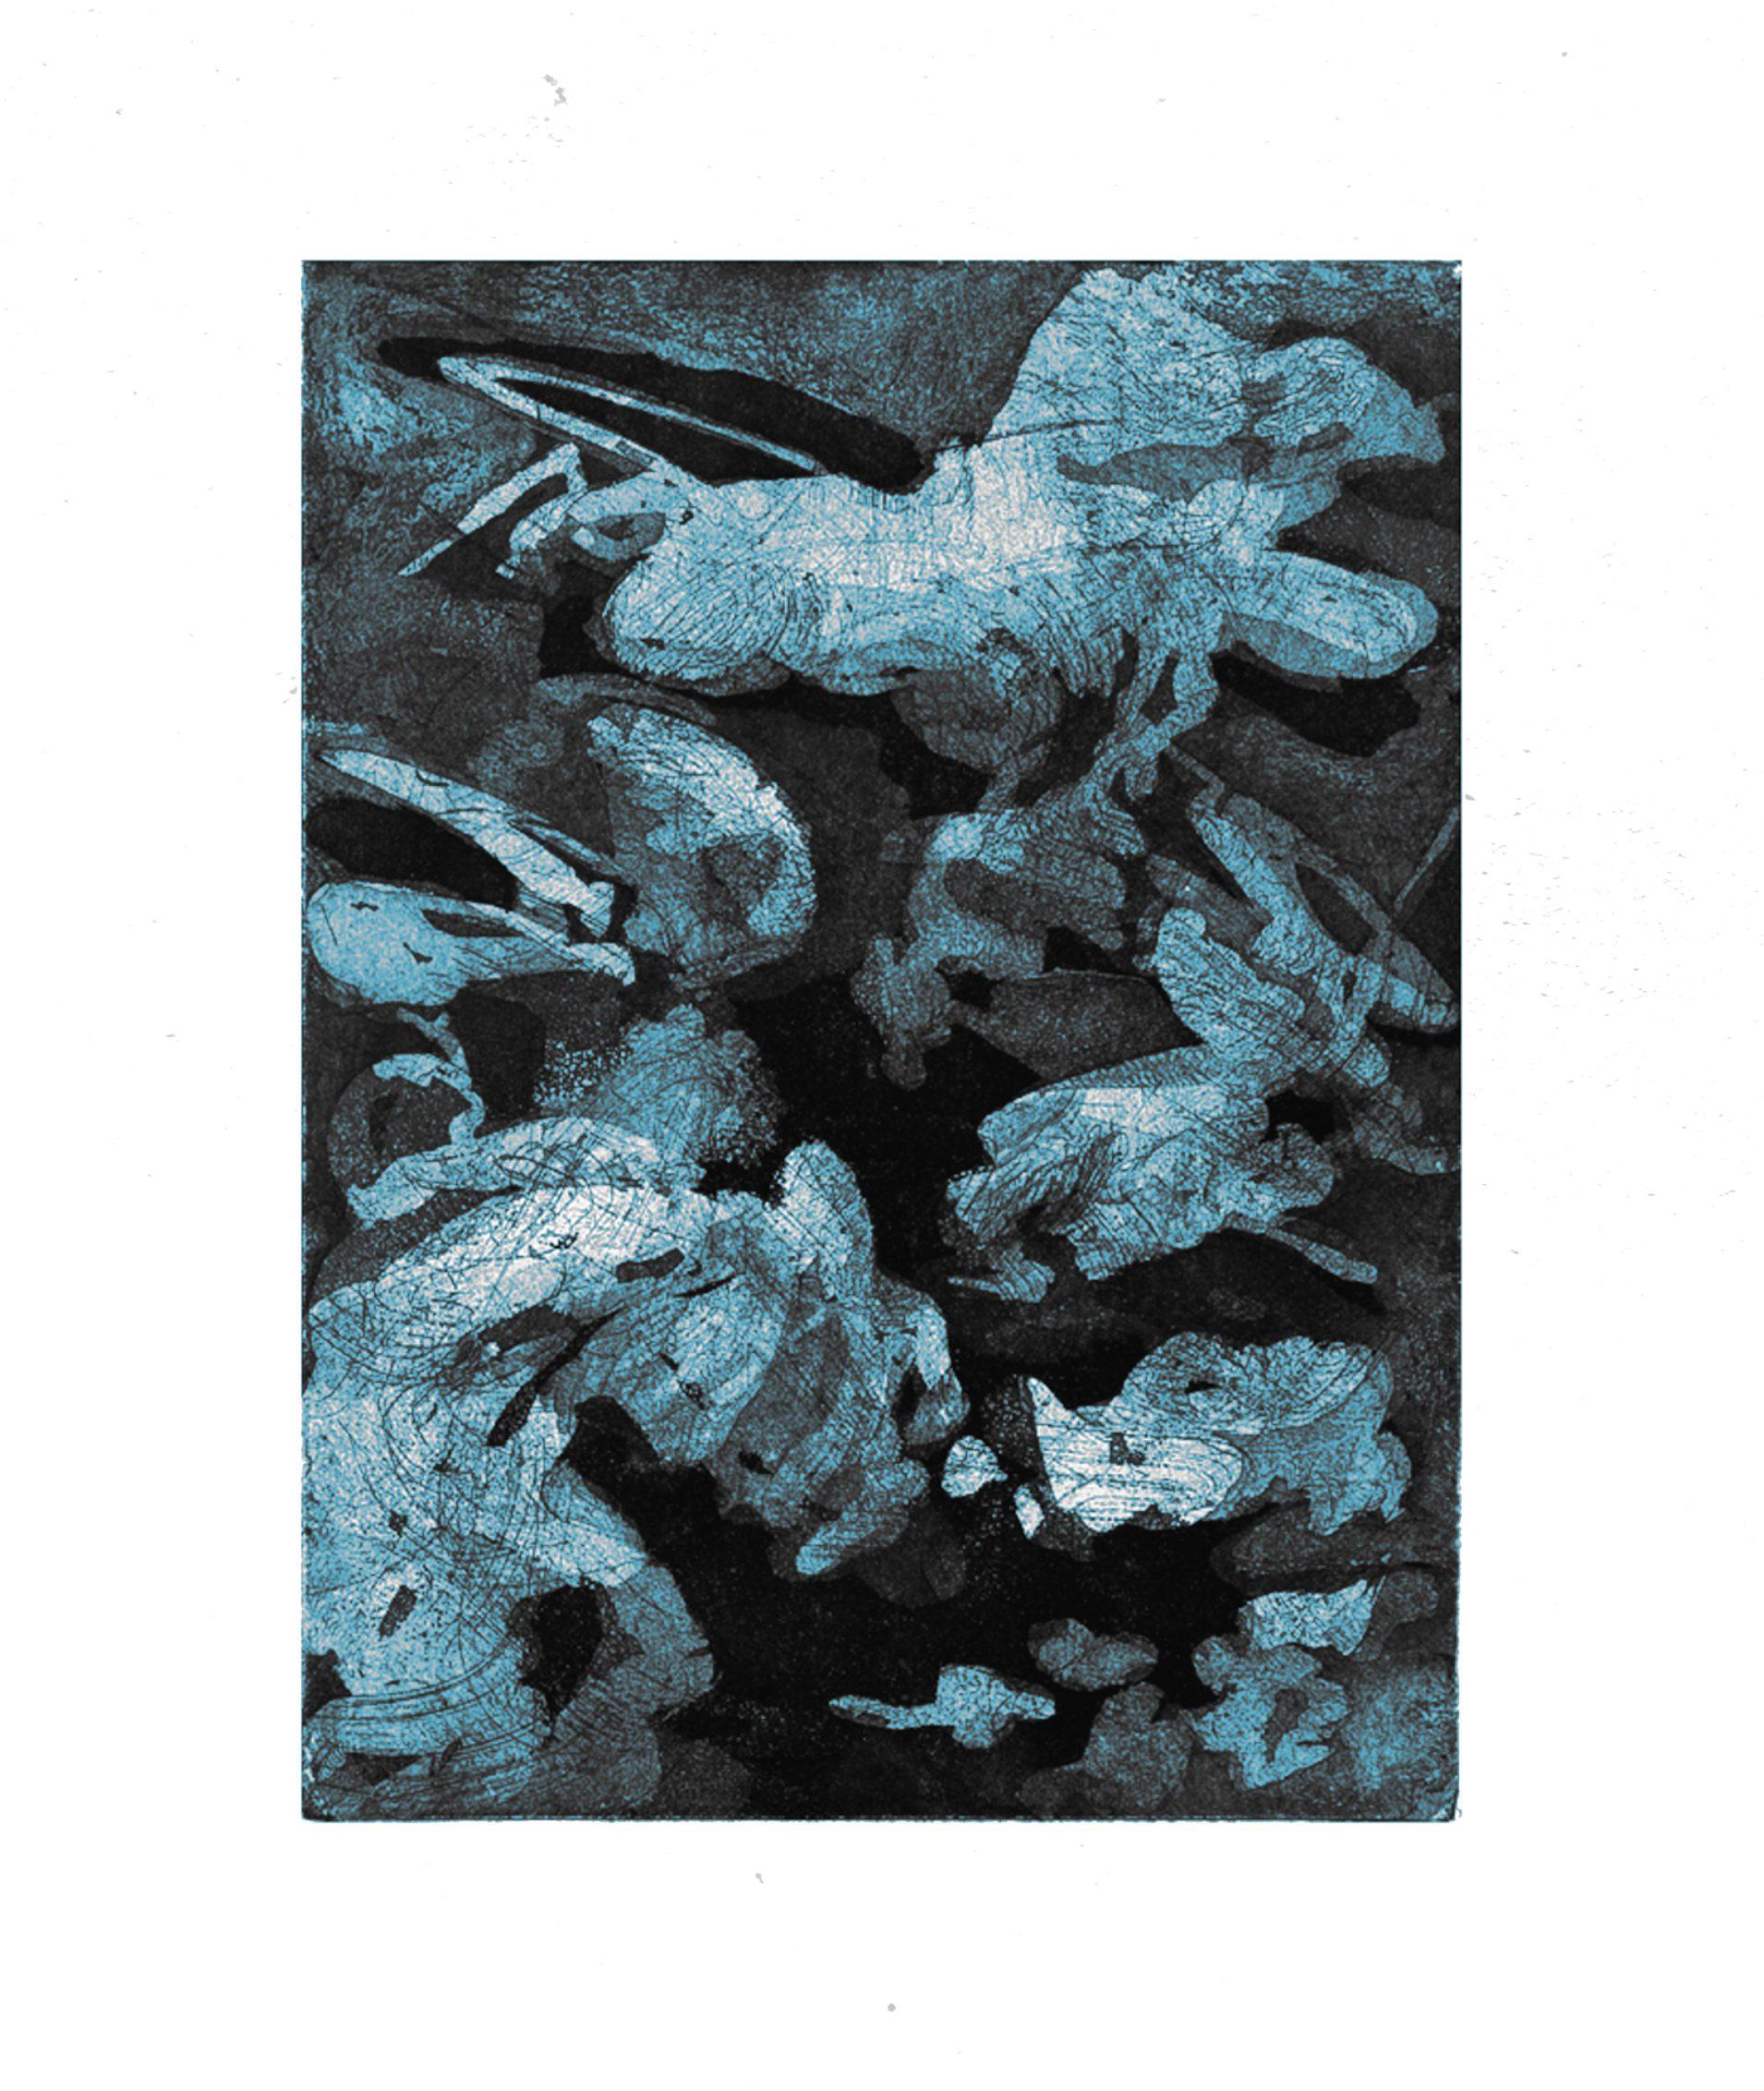 Ahondando, 2015. Aquatinta, Aquaforte on paper, 30 x 20 cm. Unique. Framed